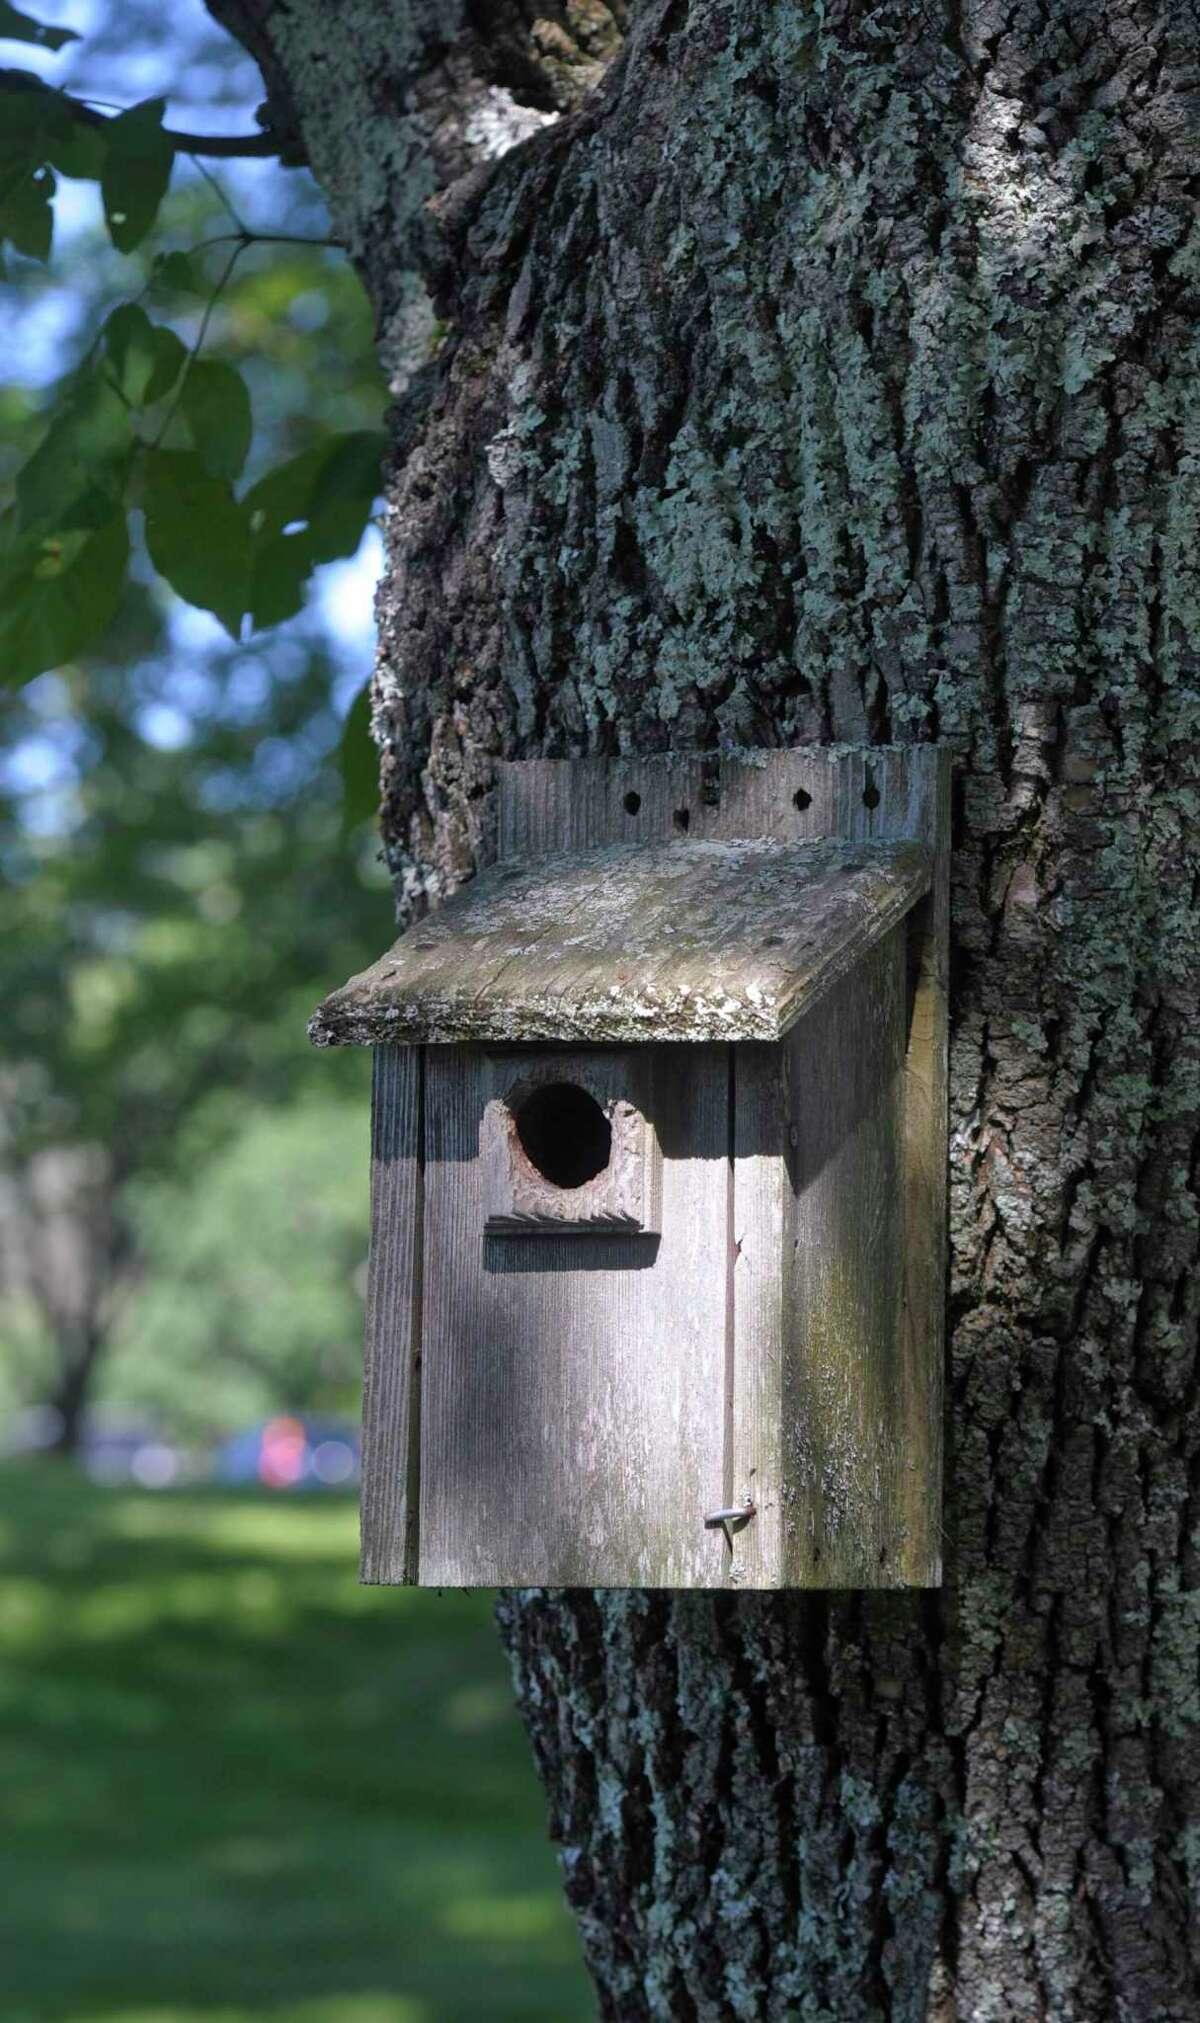 A birdhouse at the Connecticut Audubon-Deer Pond Farm in Sherman.